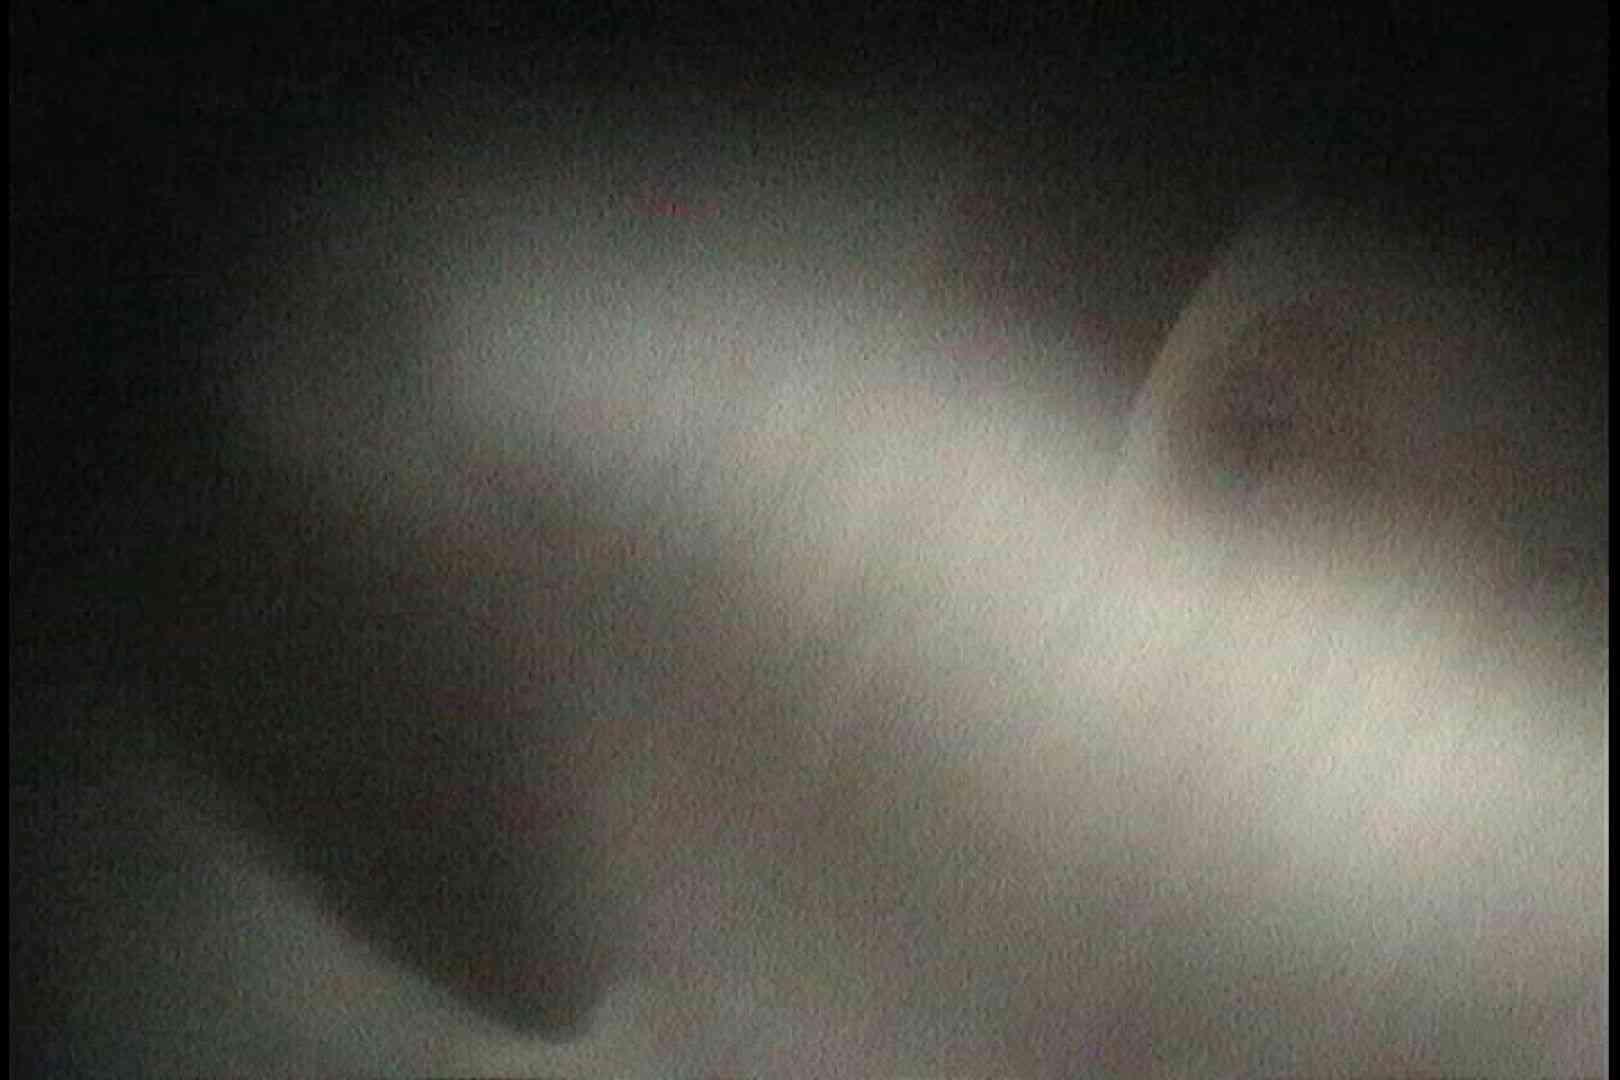 No.68 見事に可愛い巨乳ちゃん 室内暗いです 乙女〜! AV動画キャプチャ 41画像 31